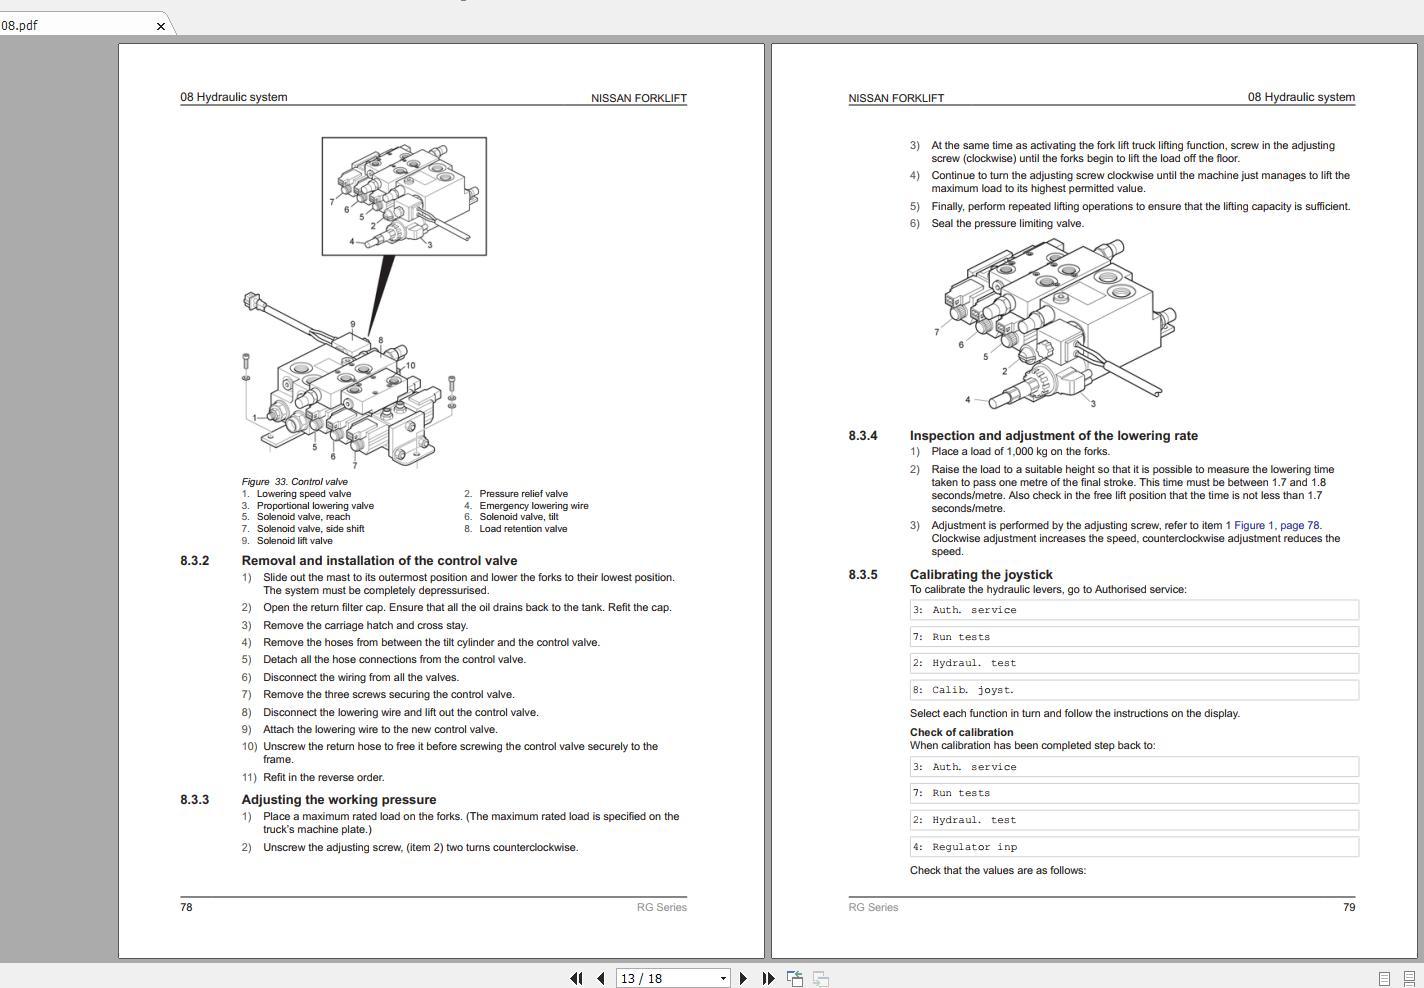 Nissan_Forklift_Warehouse_RG_Series_Service_ManualEN_3